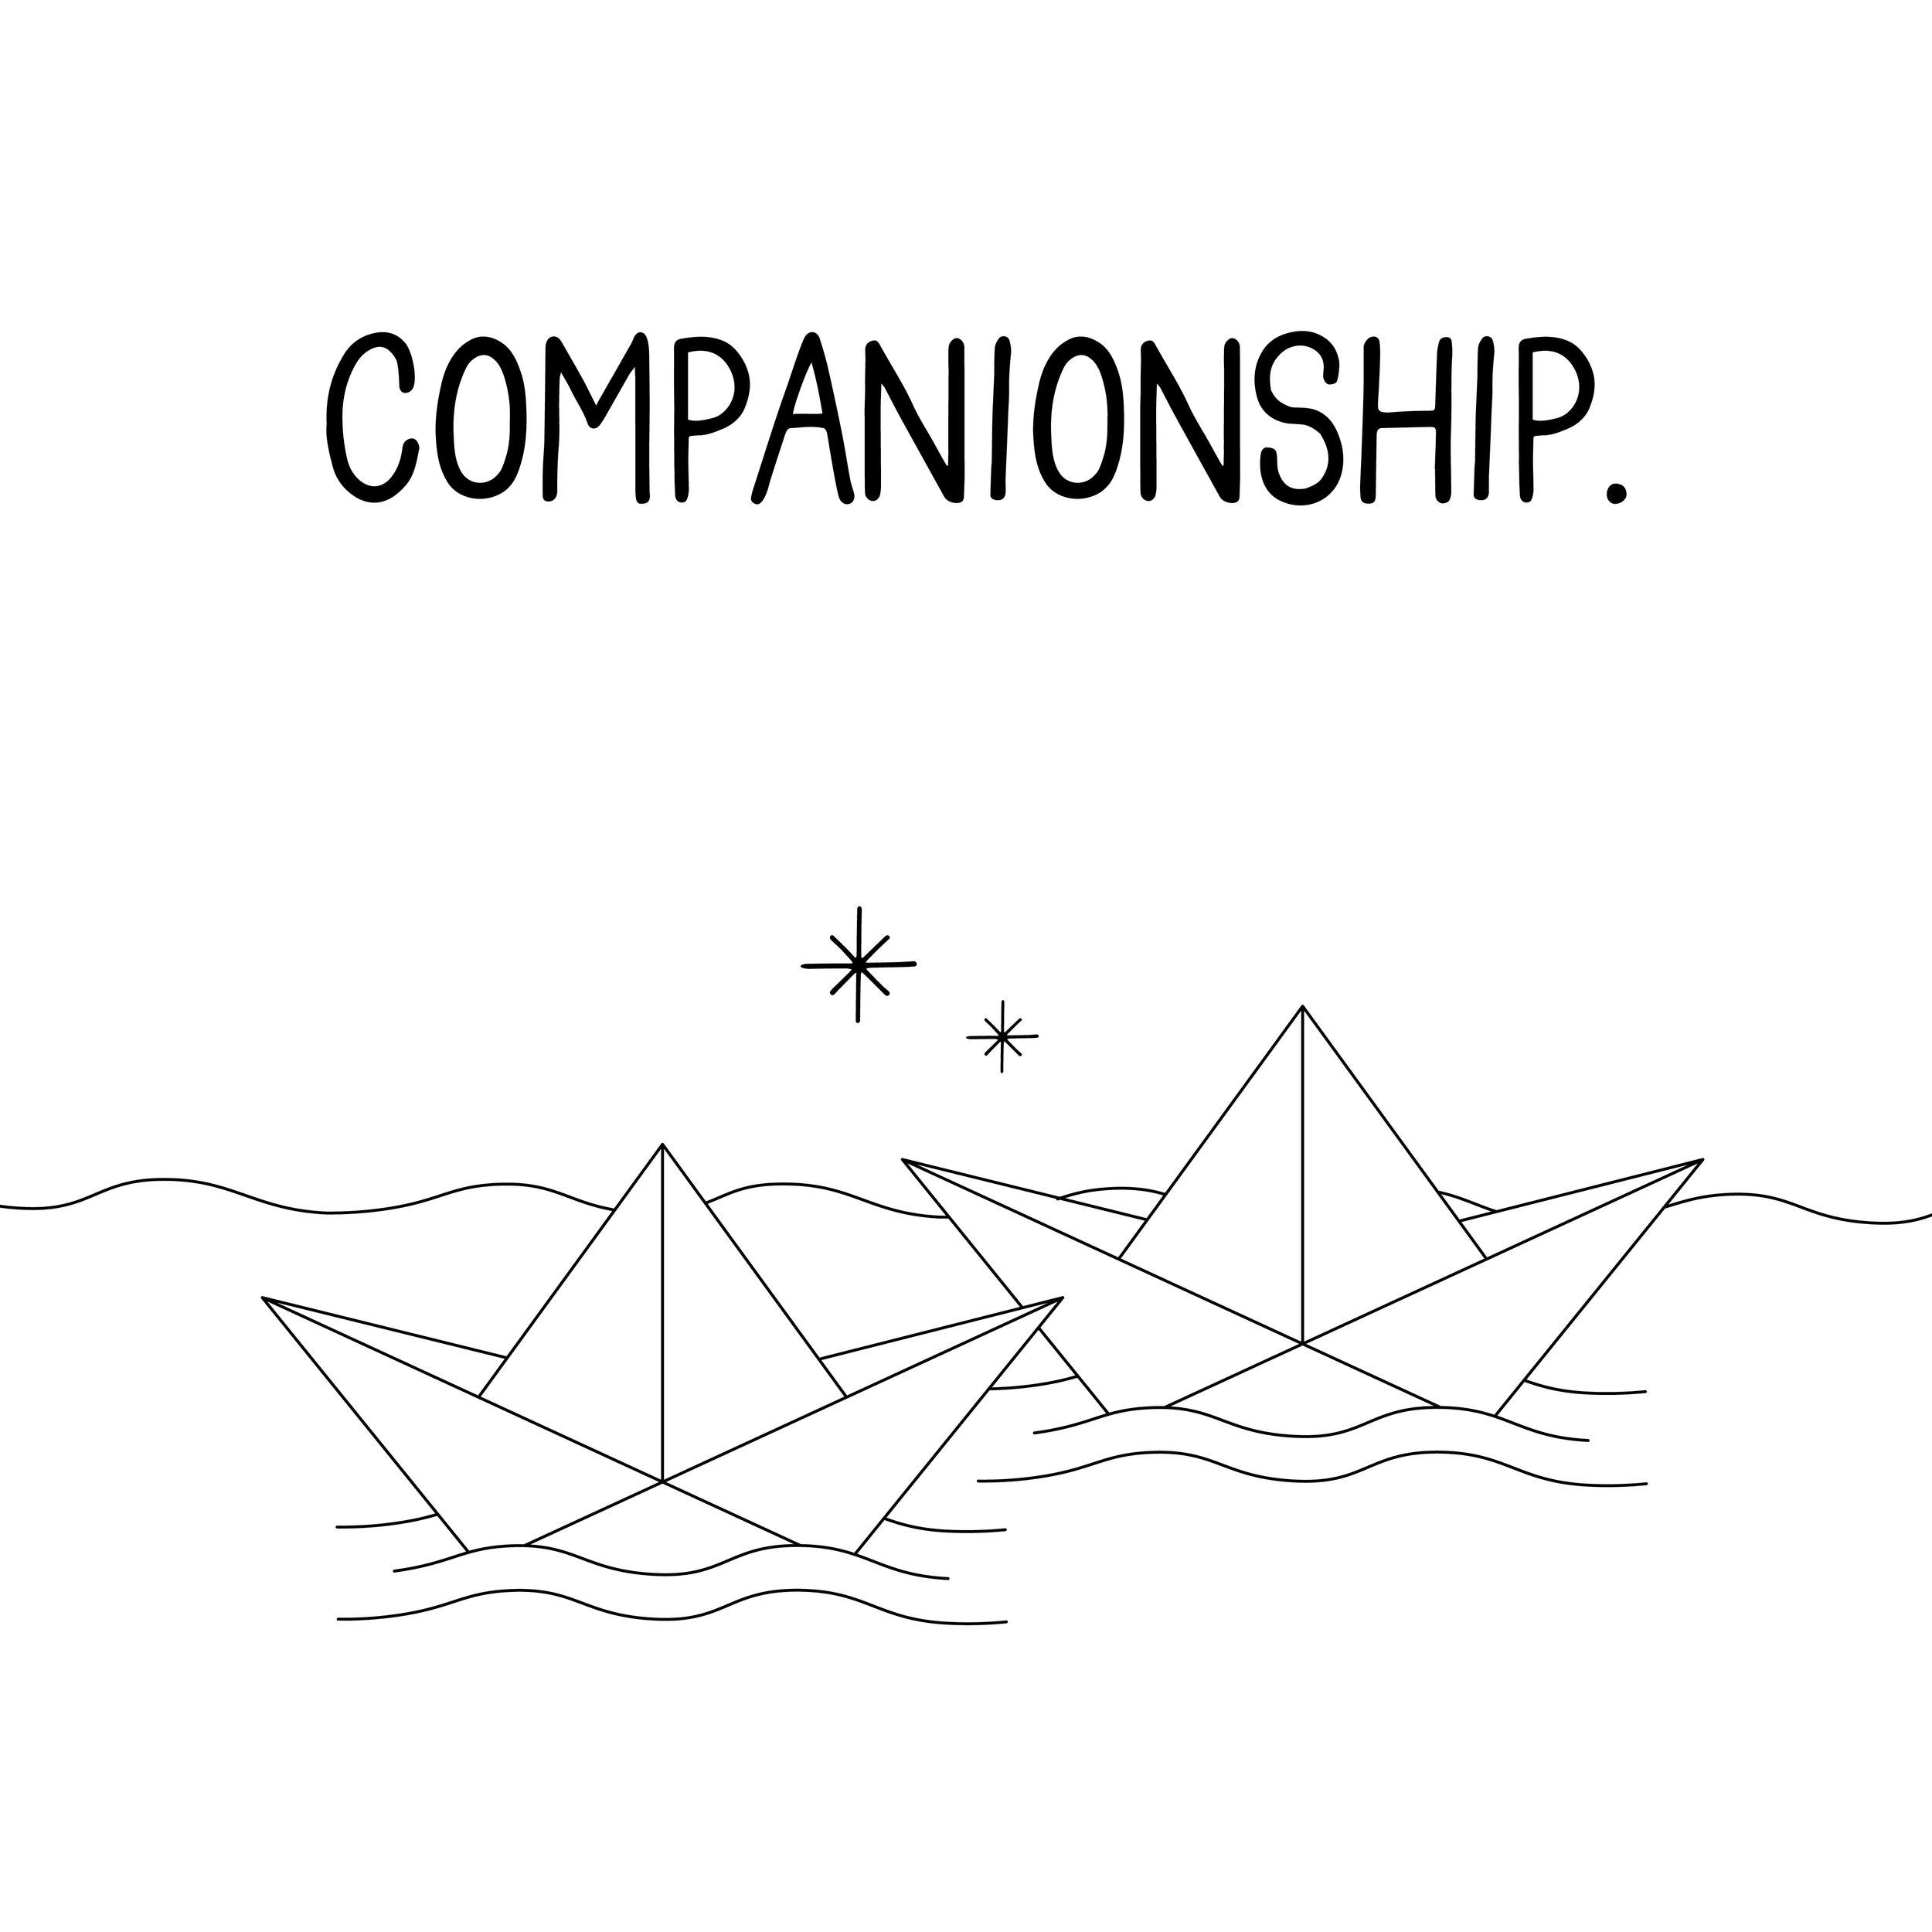 companionship-01.jpg